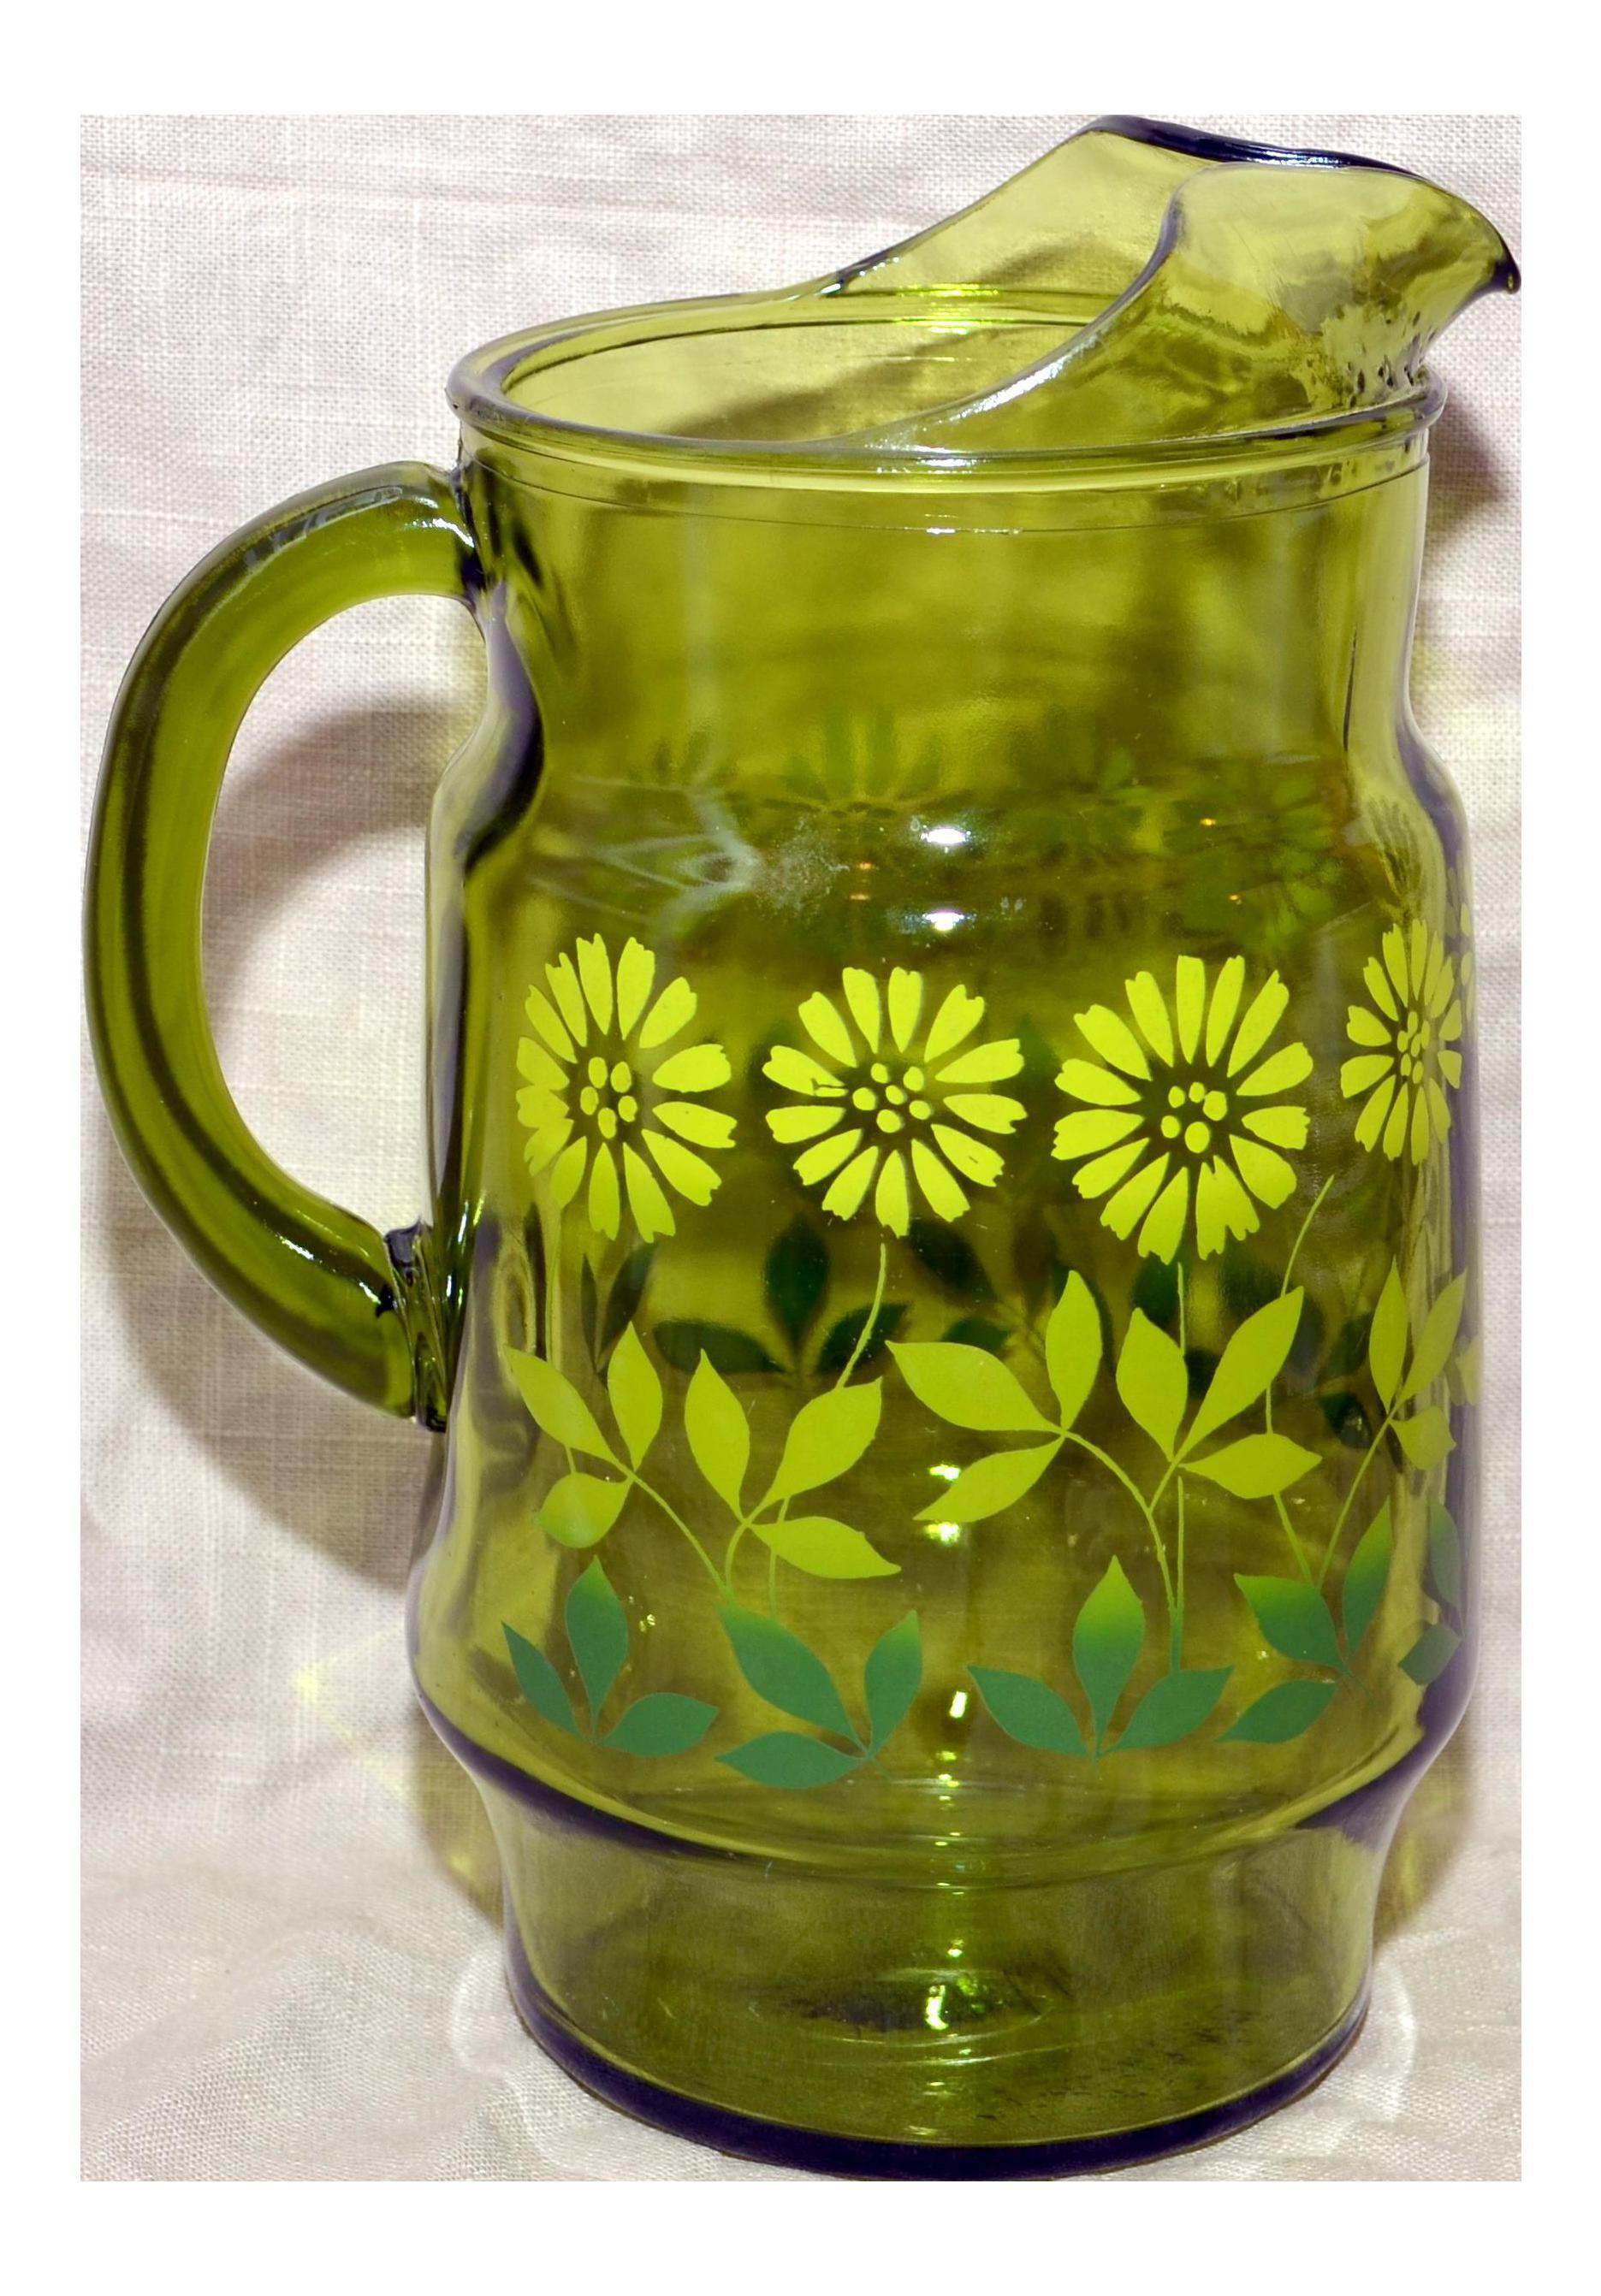 Vintage Green Glass Daisy Design Pitcher Chairish